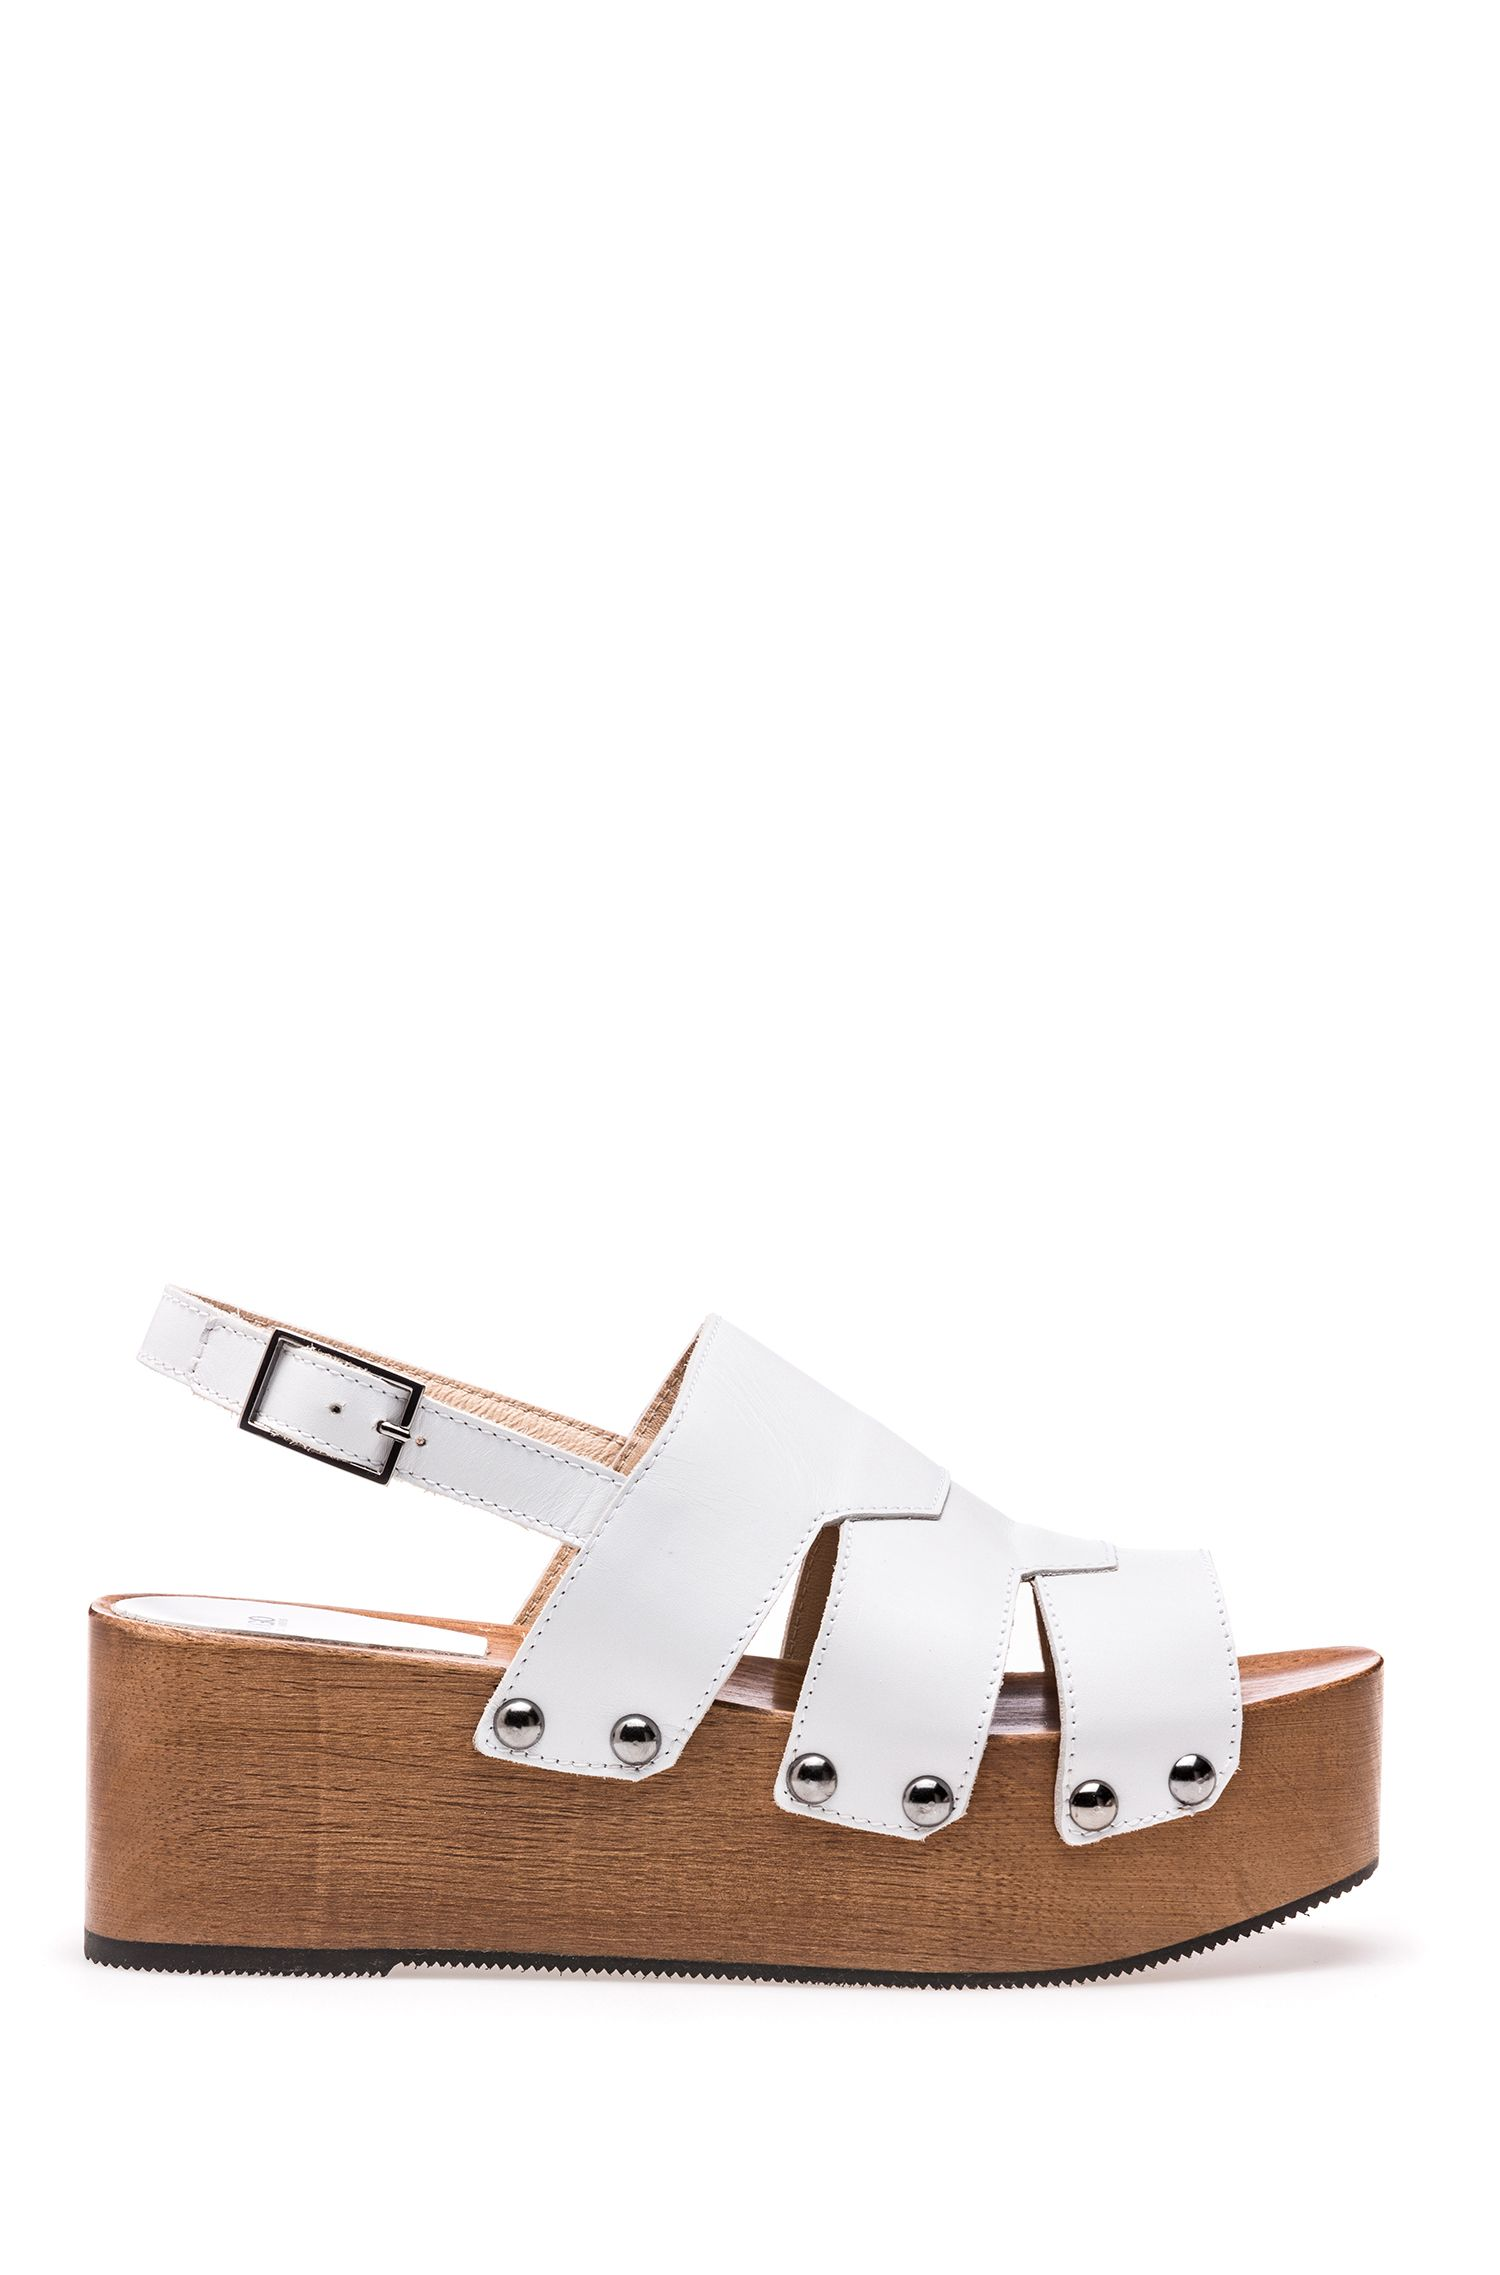 Sandalias de plataforma en piel con tachuelas